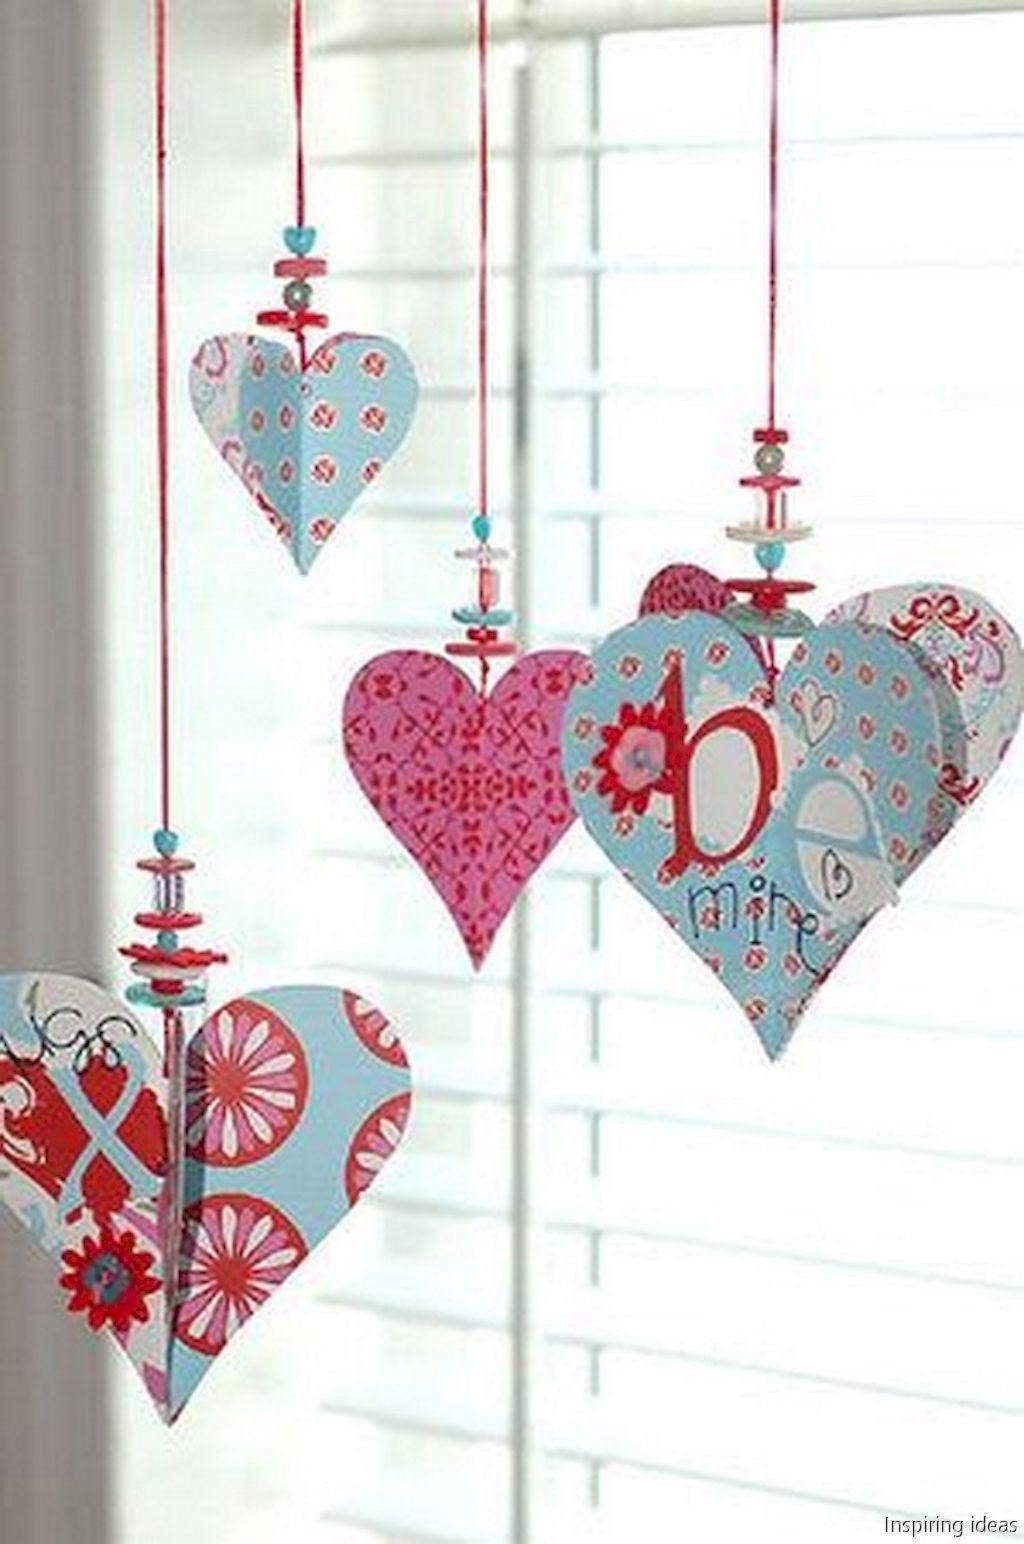 49 unforgetable valentine cards ideas homemade | Pinterest | Cards ...